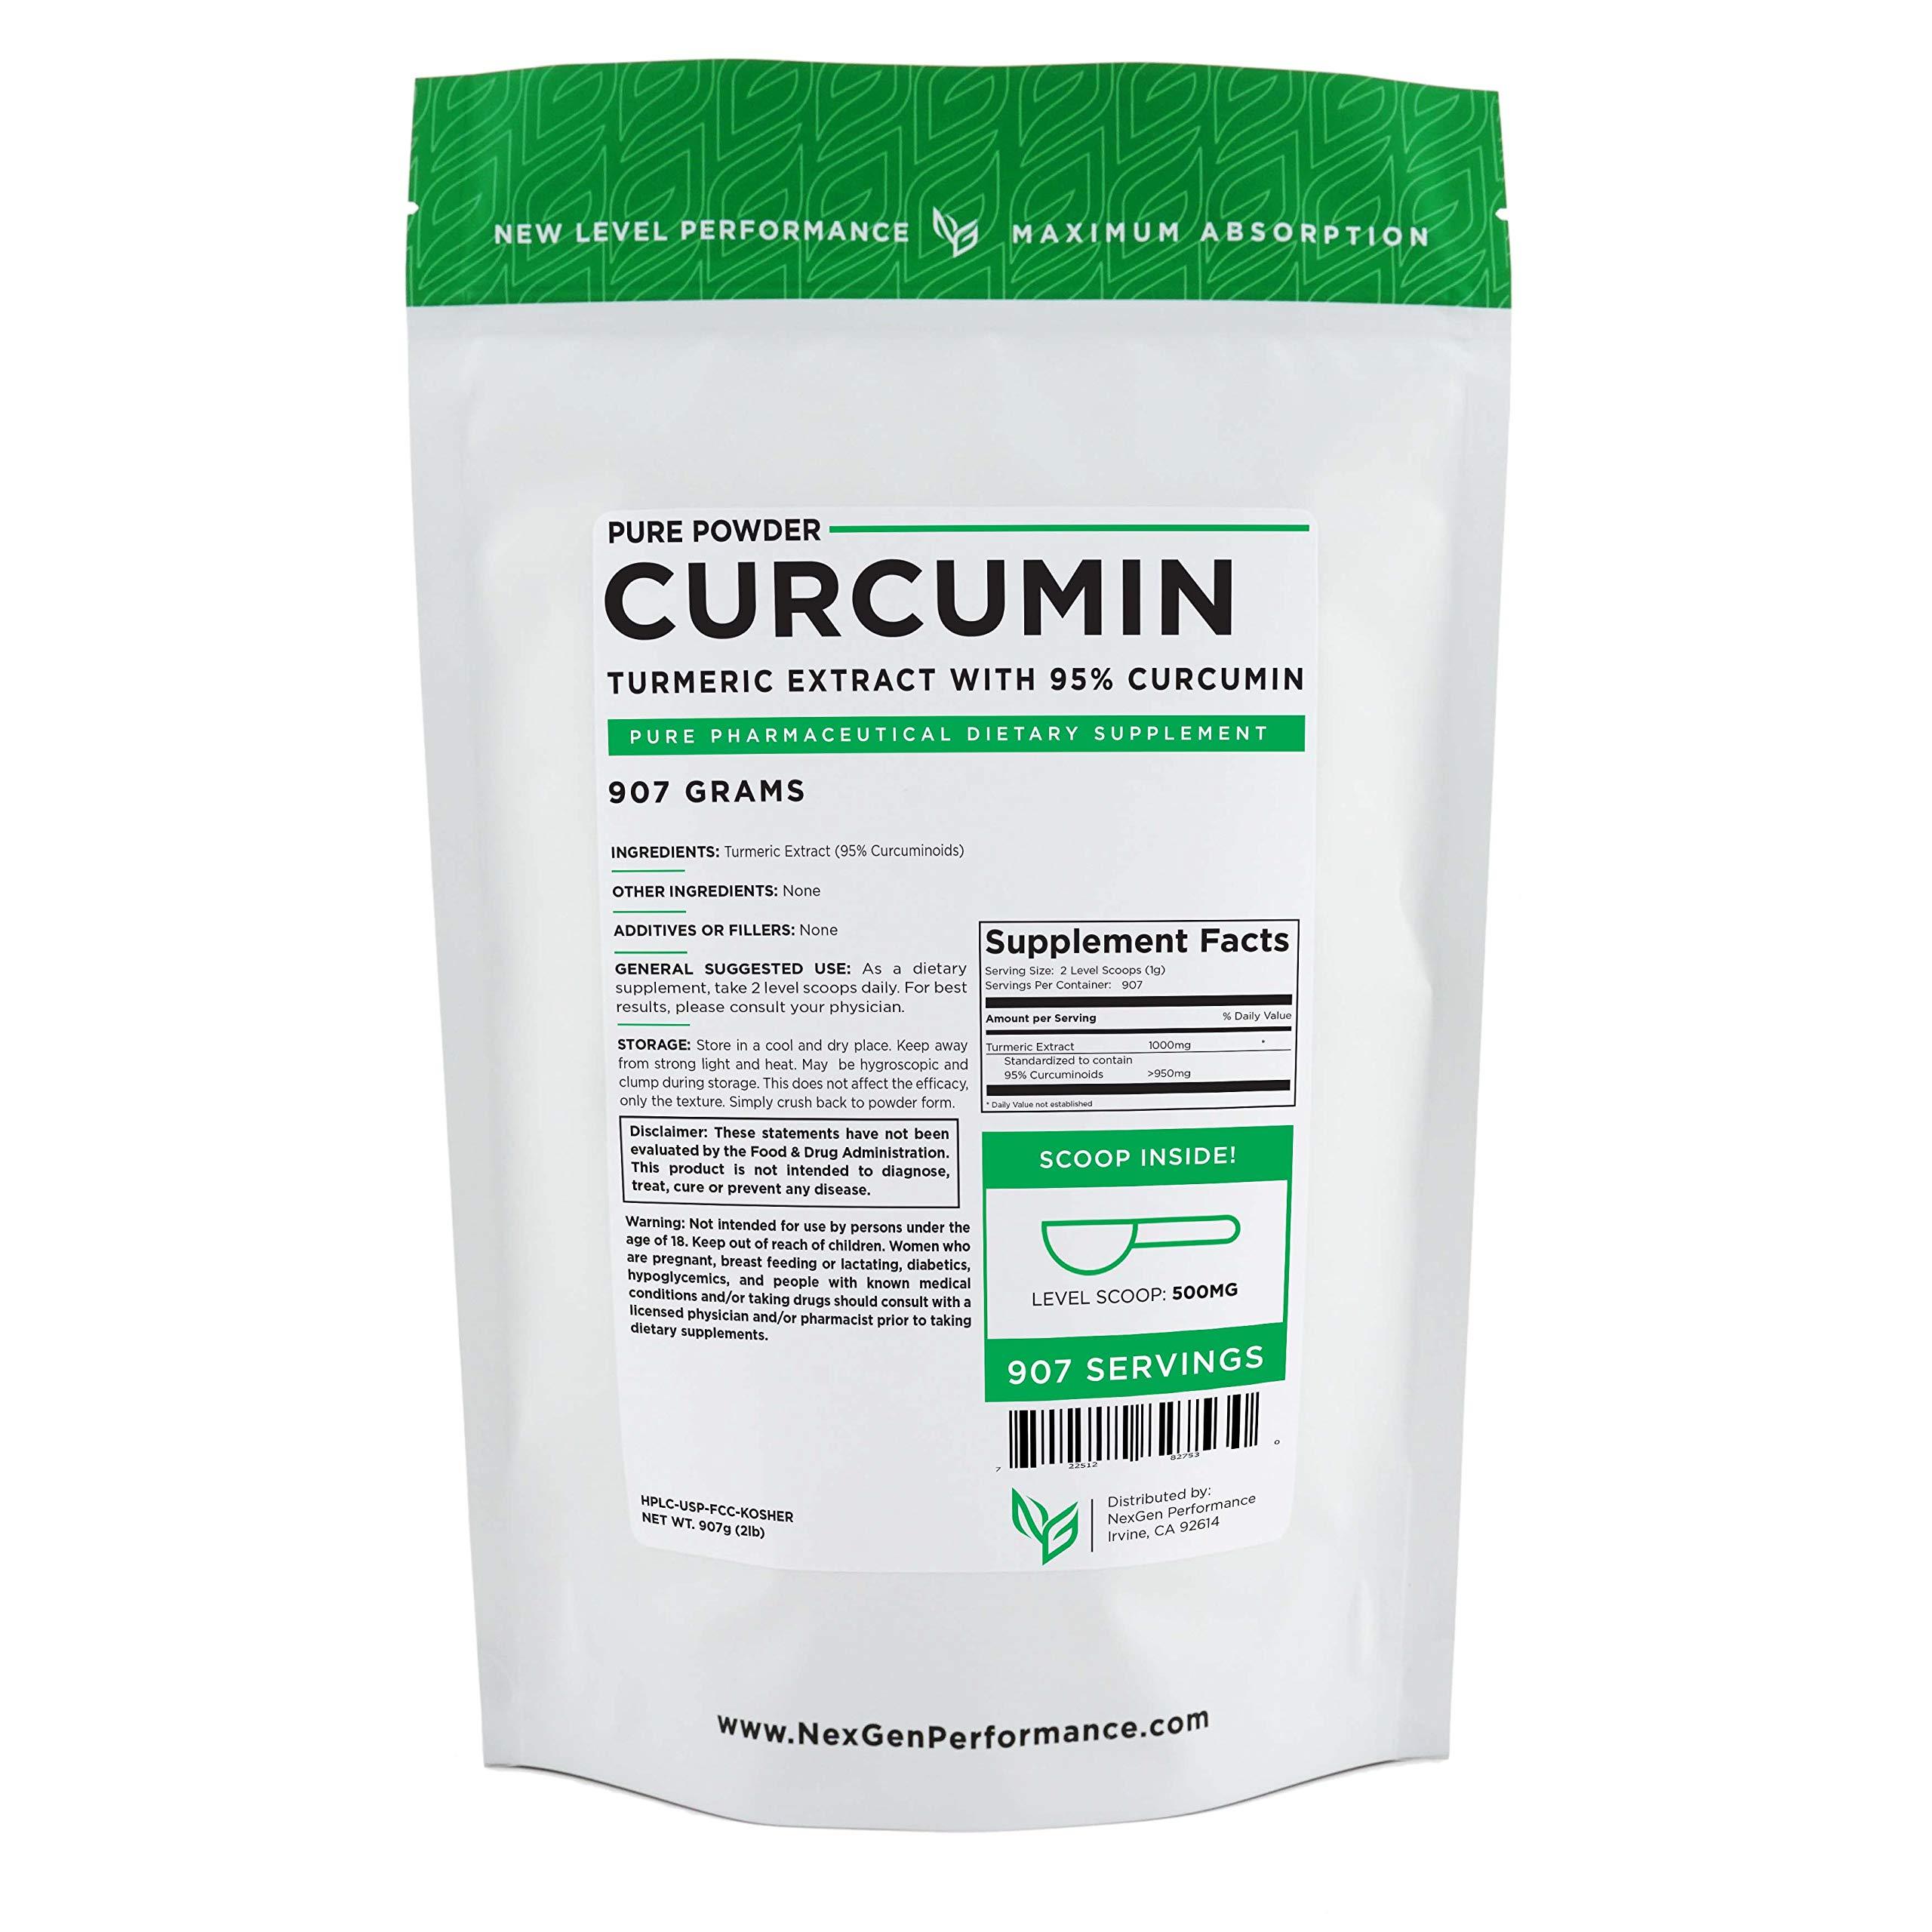 Curcumin 95% Curcuminoids -Natural Turmeric Extract Powder - Highest Quality (2lb (32oz))